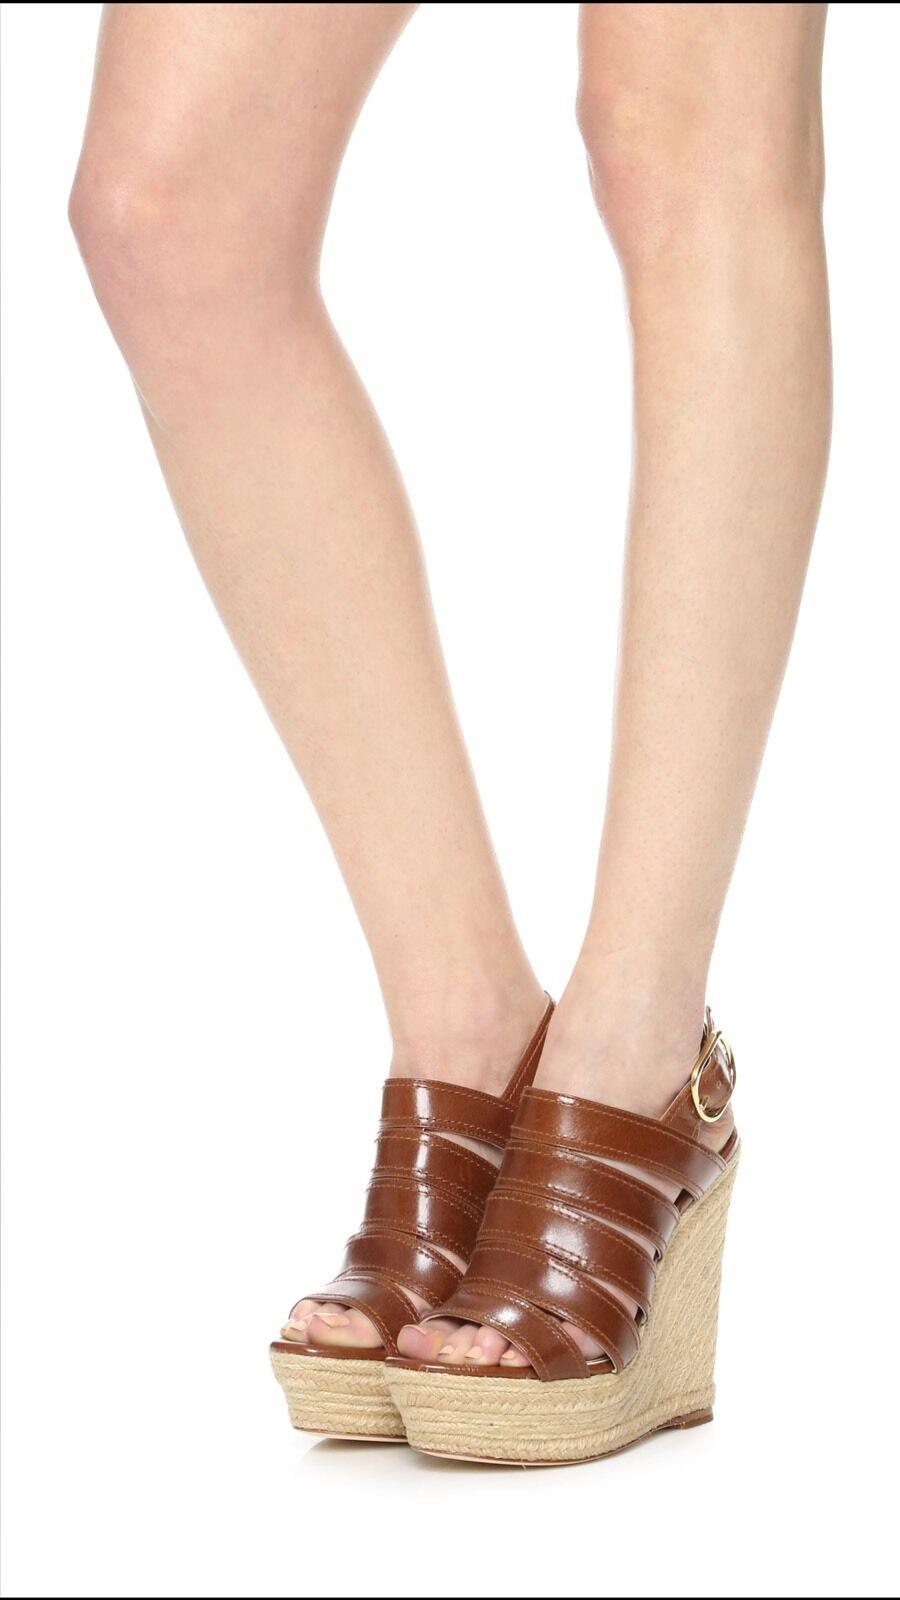 NEW  348 Rachel Zoe Gia Espadrille Wedge Sandals shoes 8.5 M Brandy